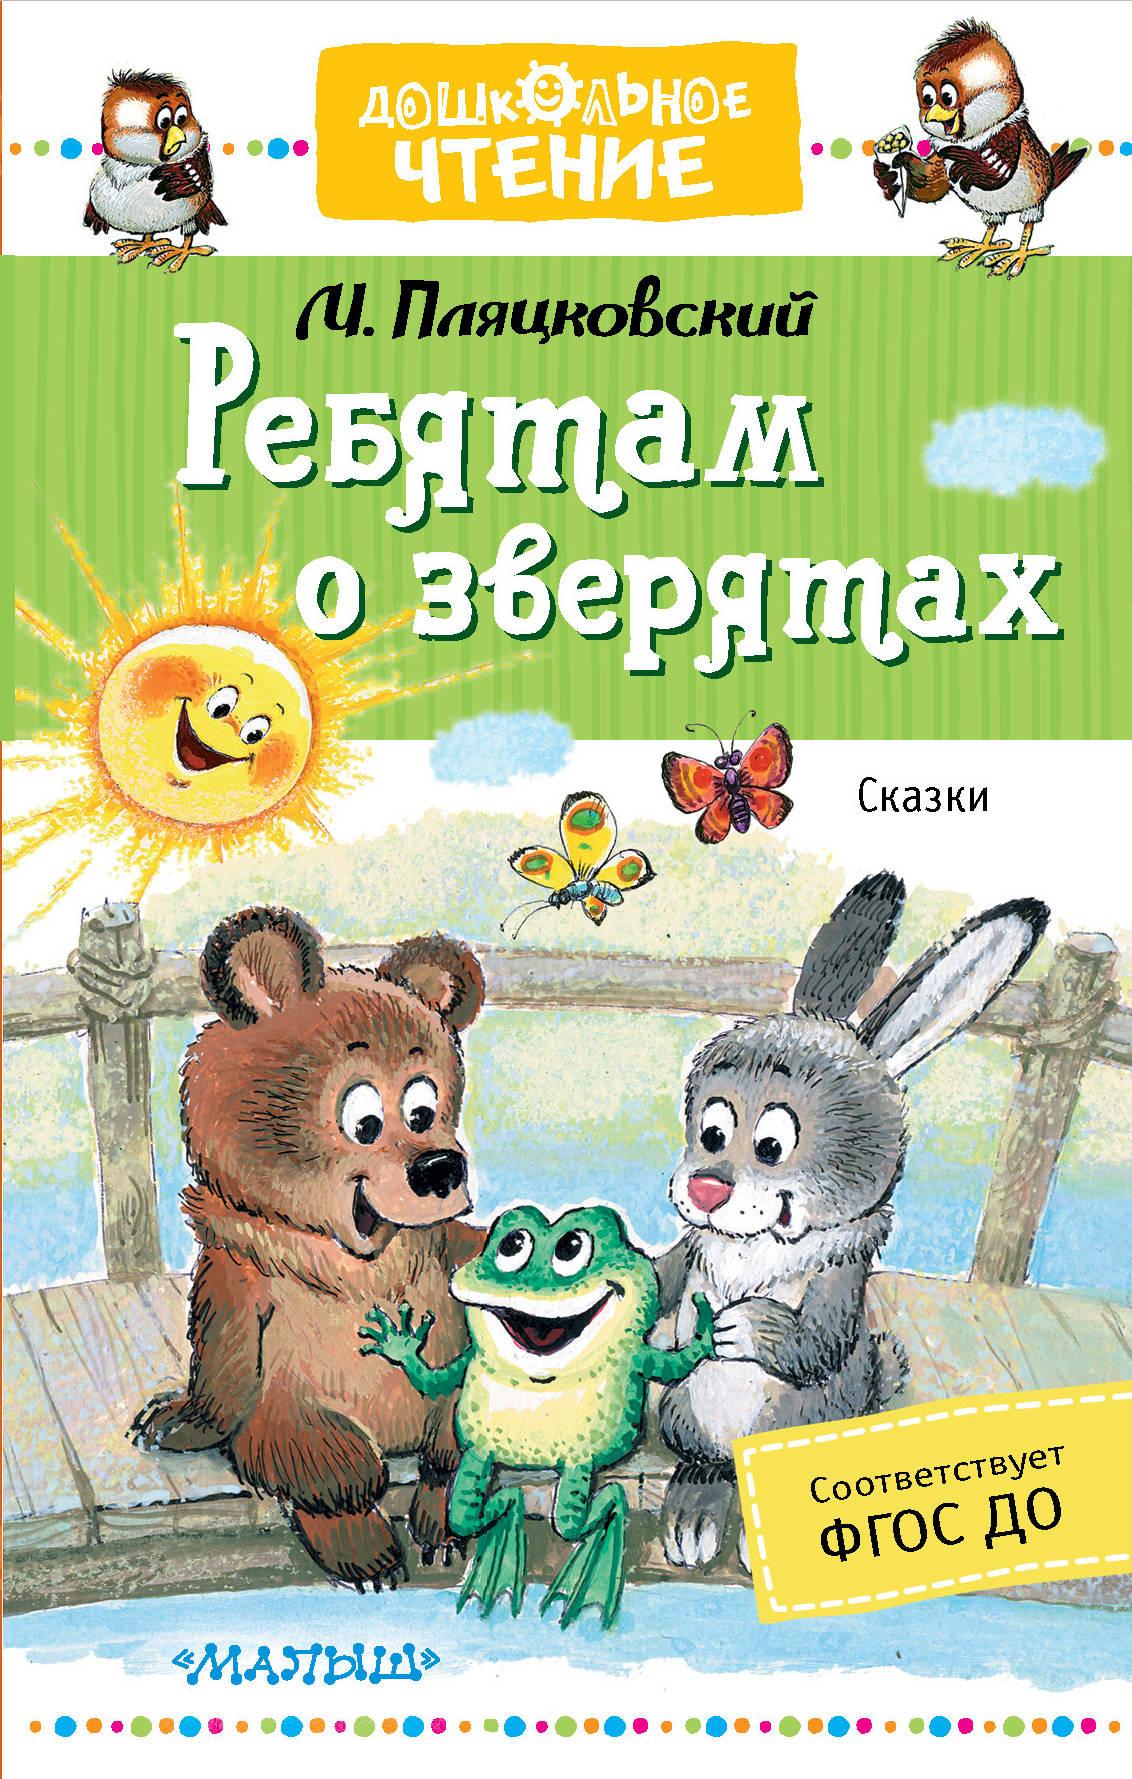 М. Пляцковский Ребятам о зверятах. Сказки миньон м 100 песенок для маленьких